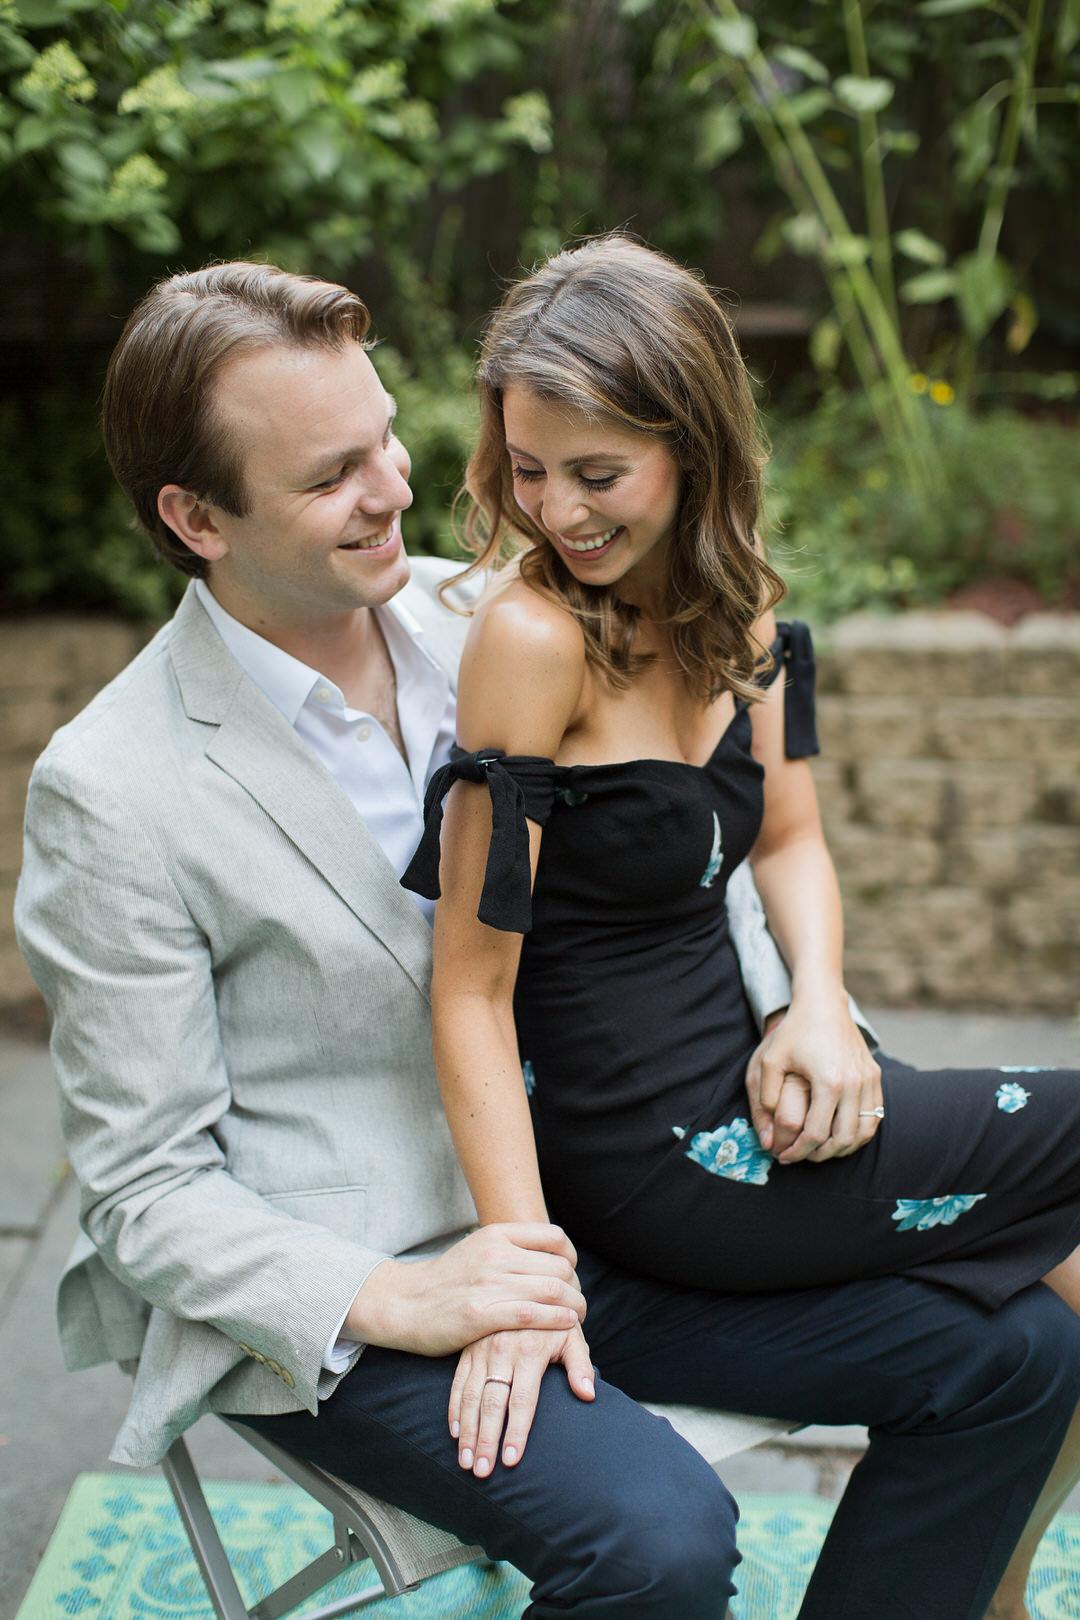 Melissa Kruse Photography - Meghan & Pete Engagement Photos-18.jpg